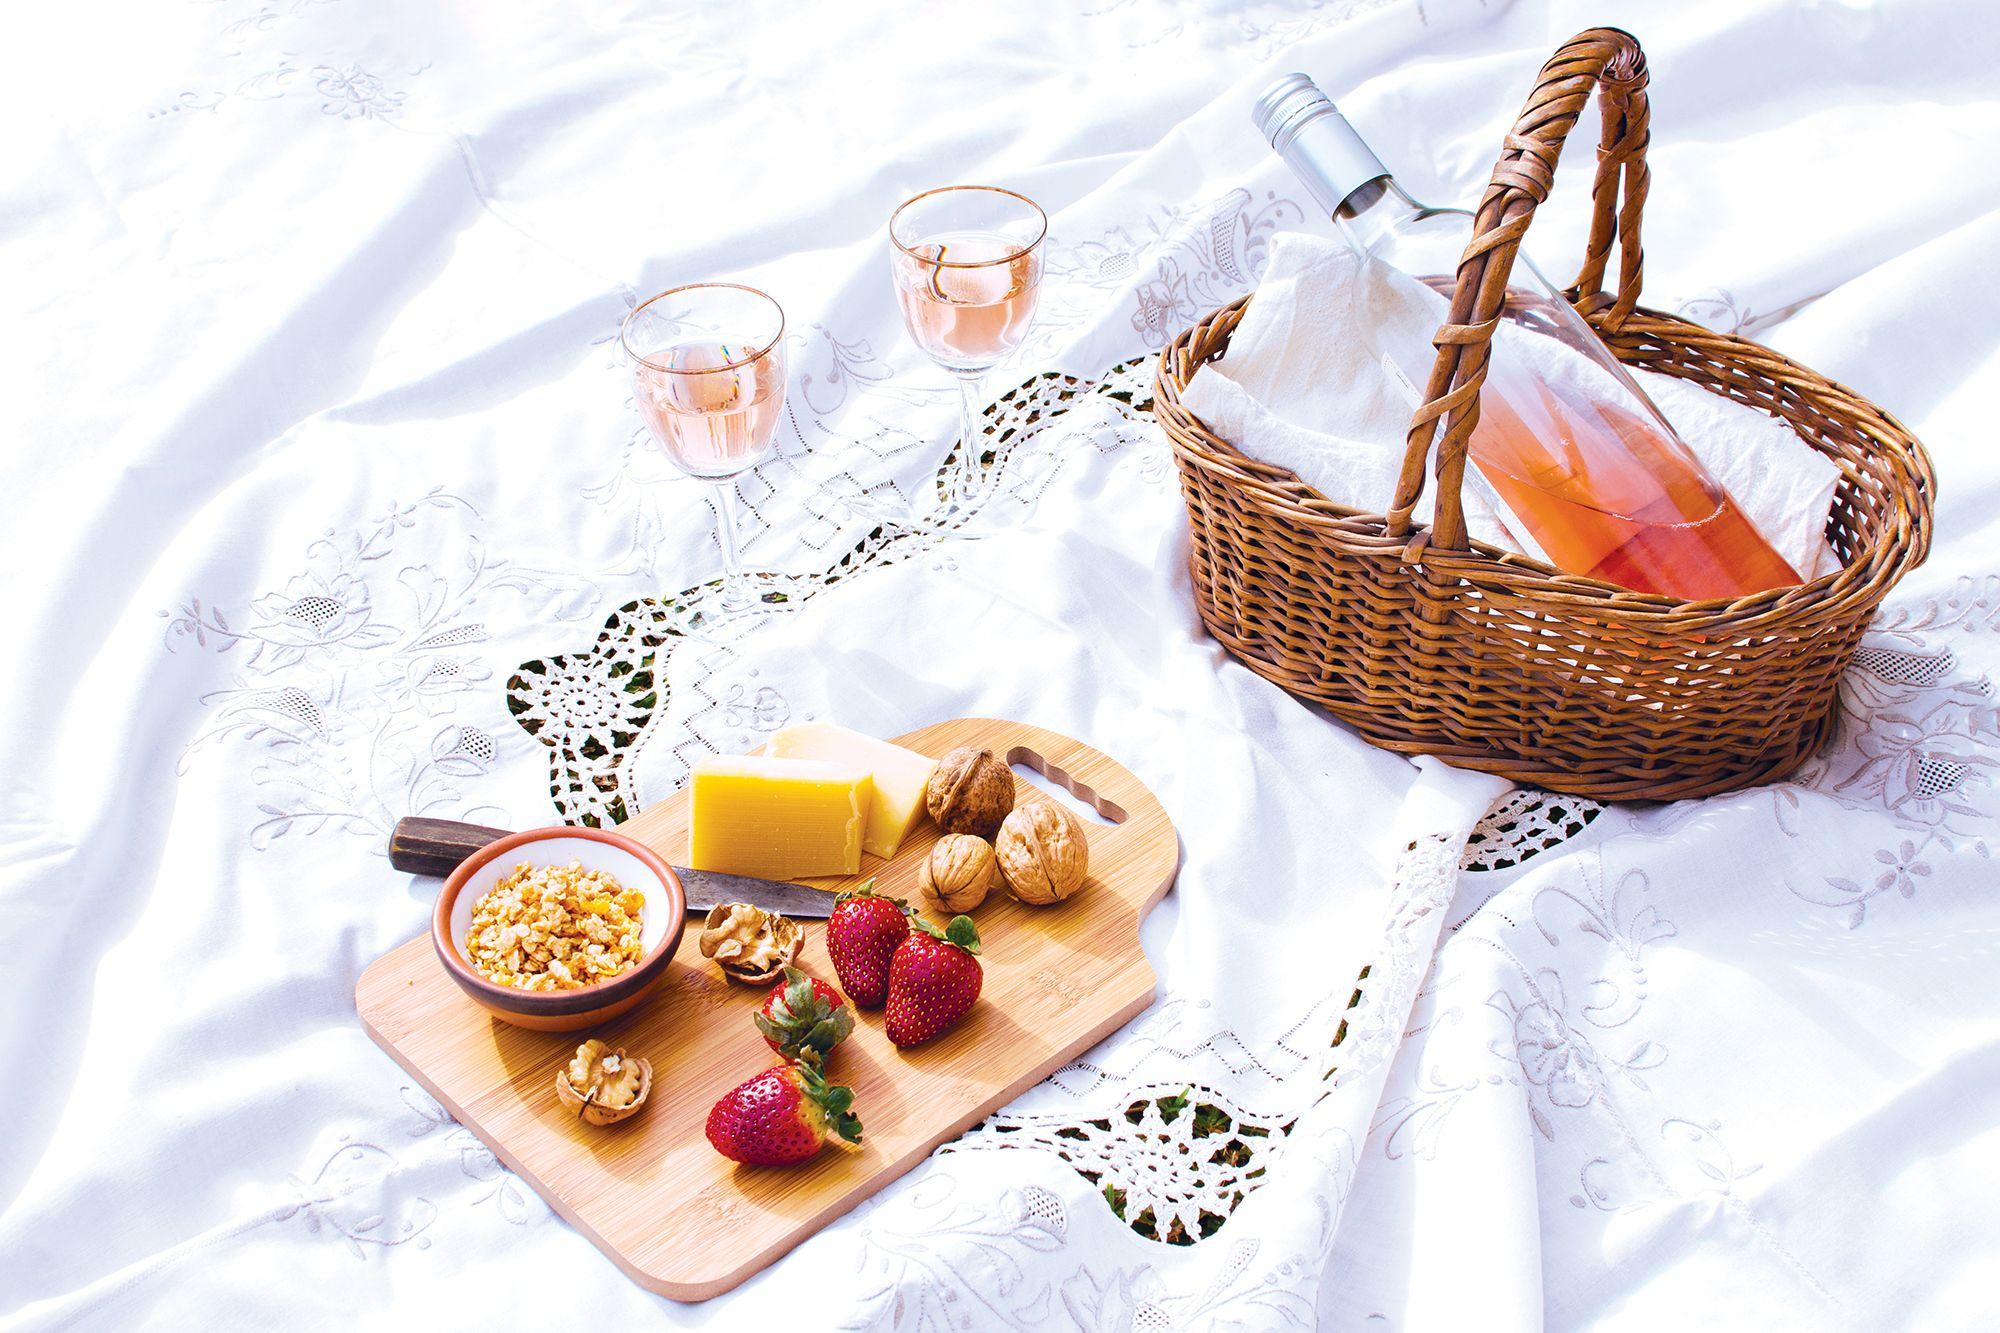 Wine 101: Tatler Philippines' Food & Wine Editor Stephanie Zubiri on Rosé